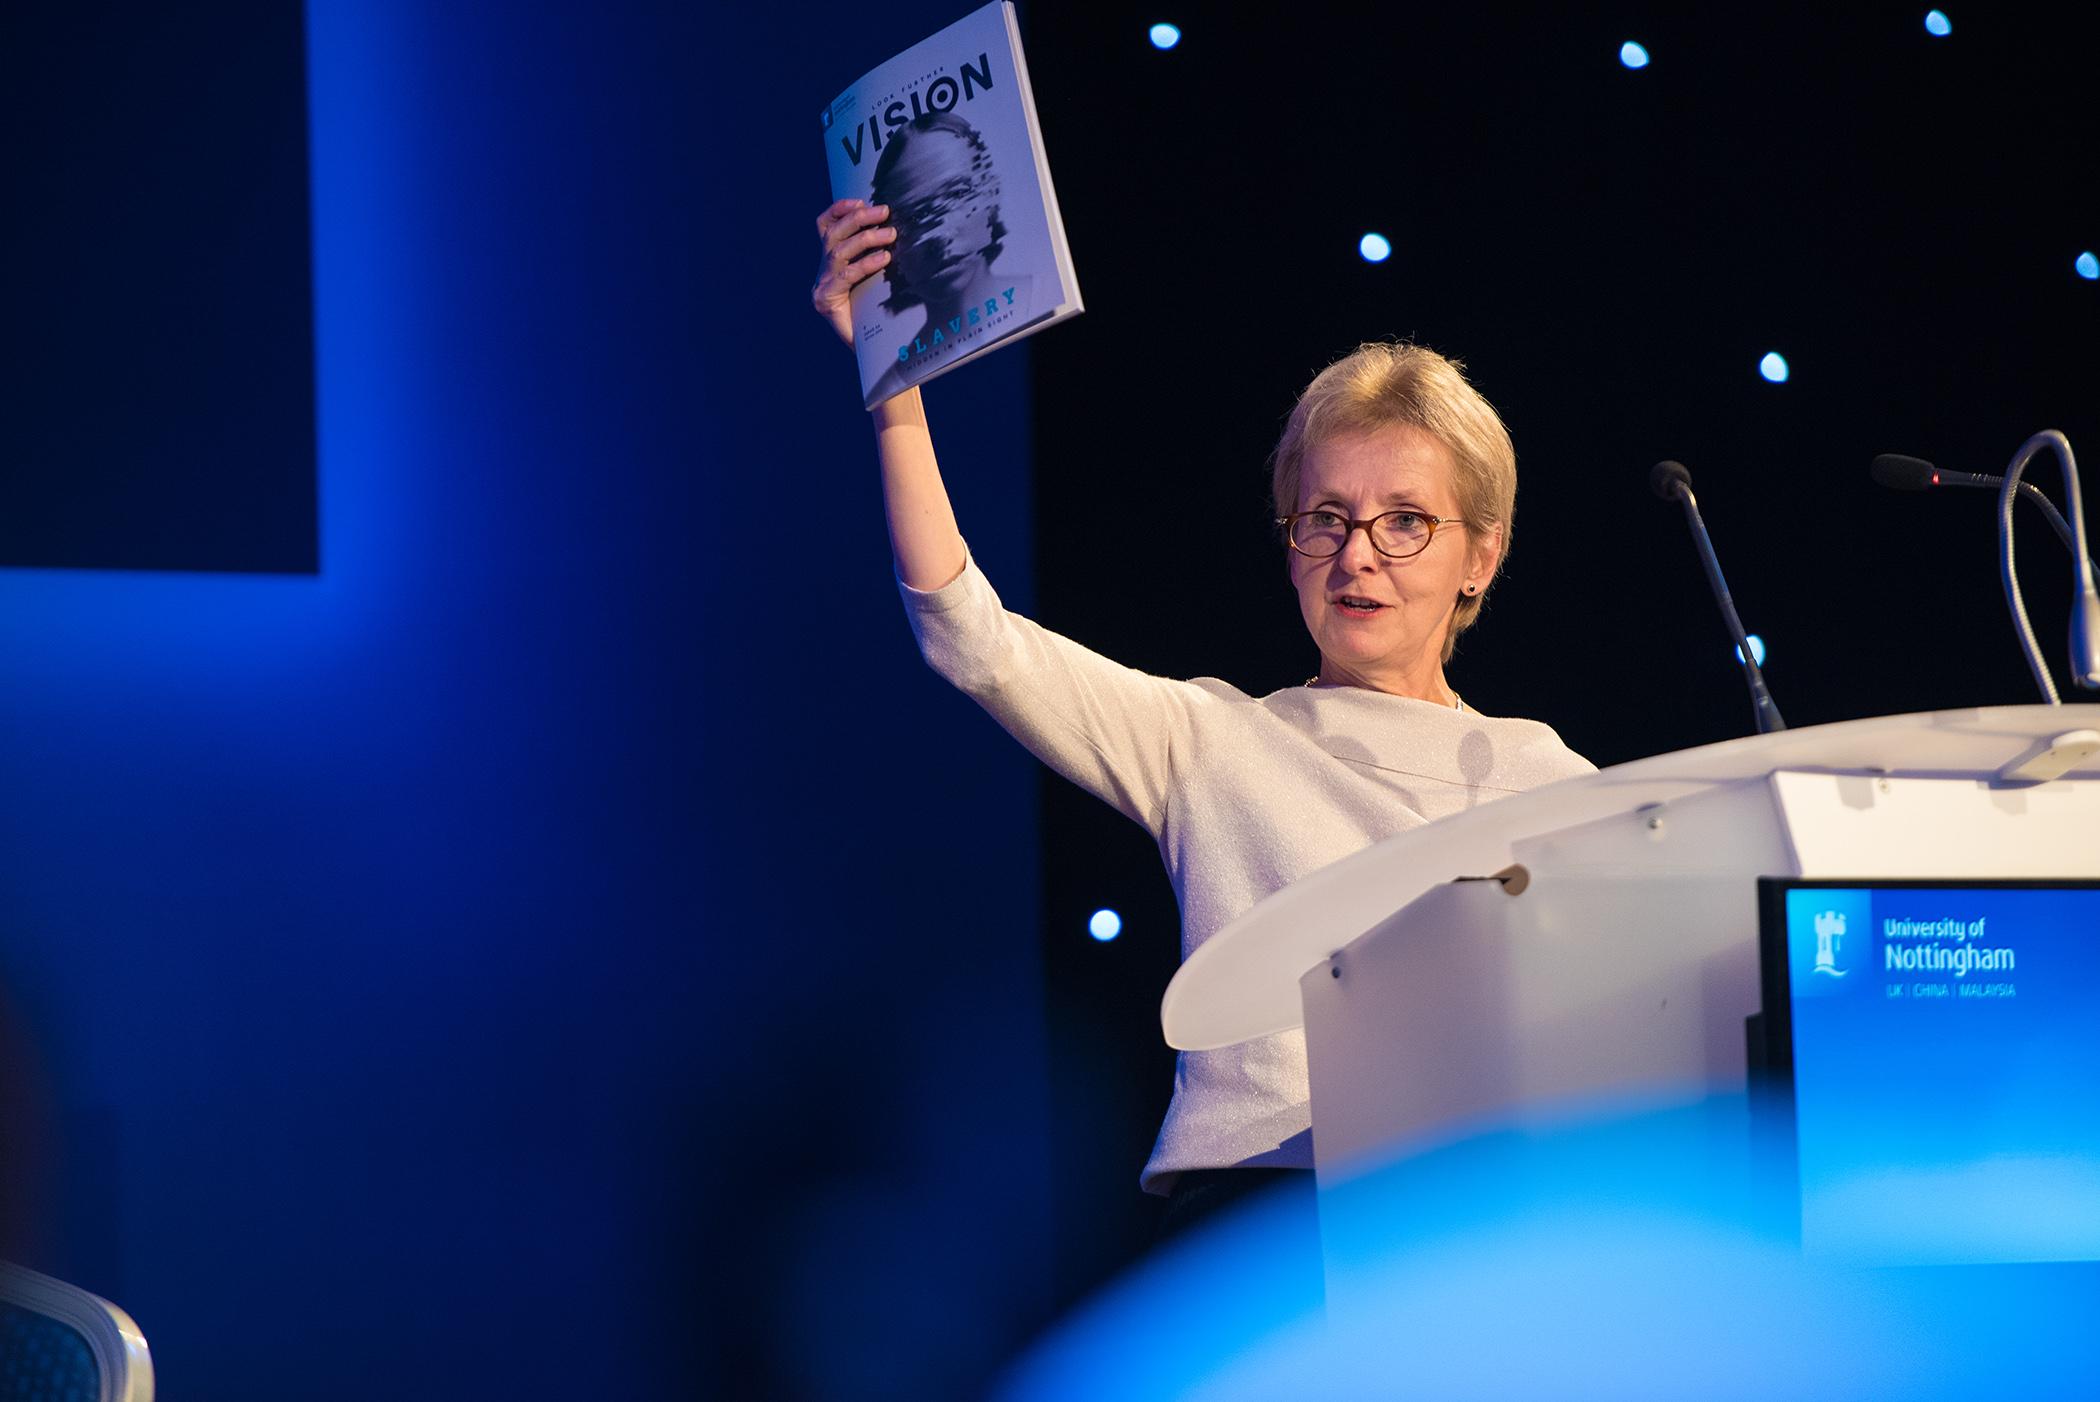 Professor Dame Jessica Corner with Vision magazine